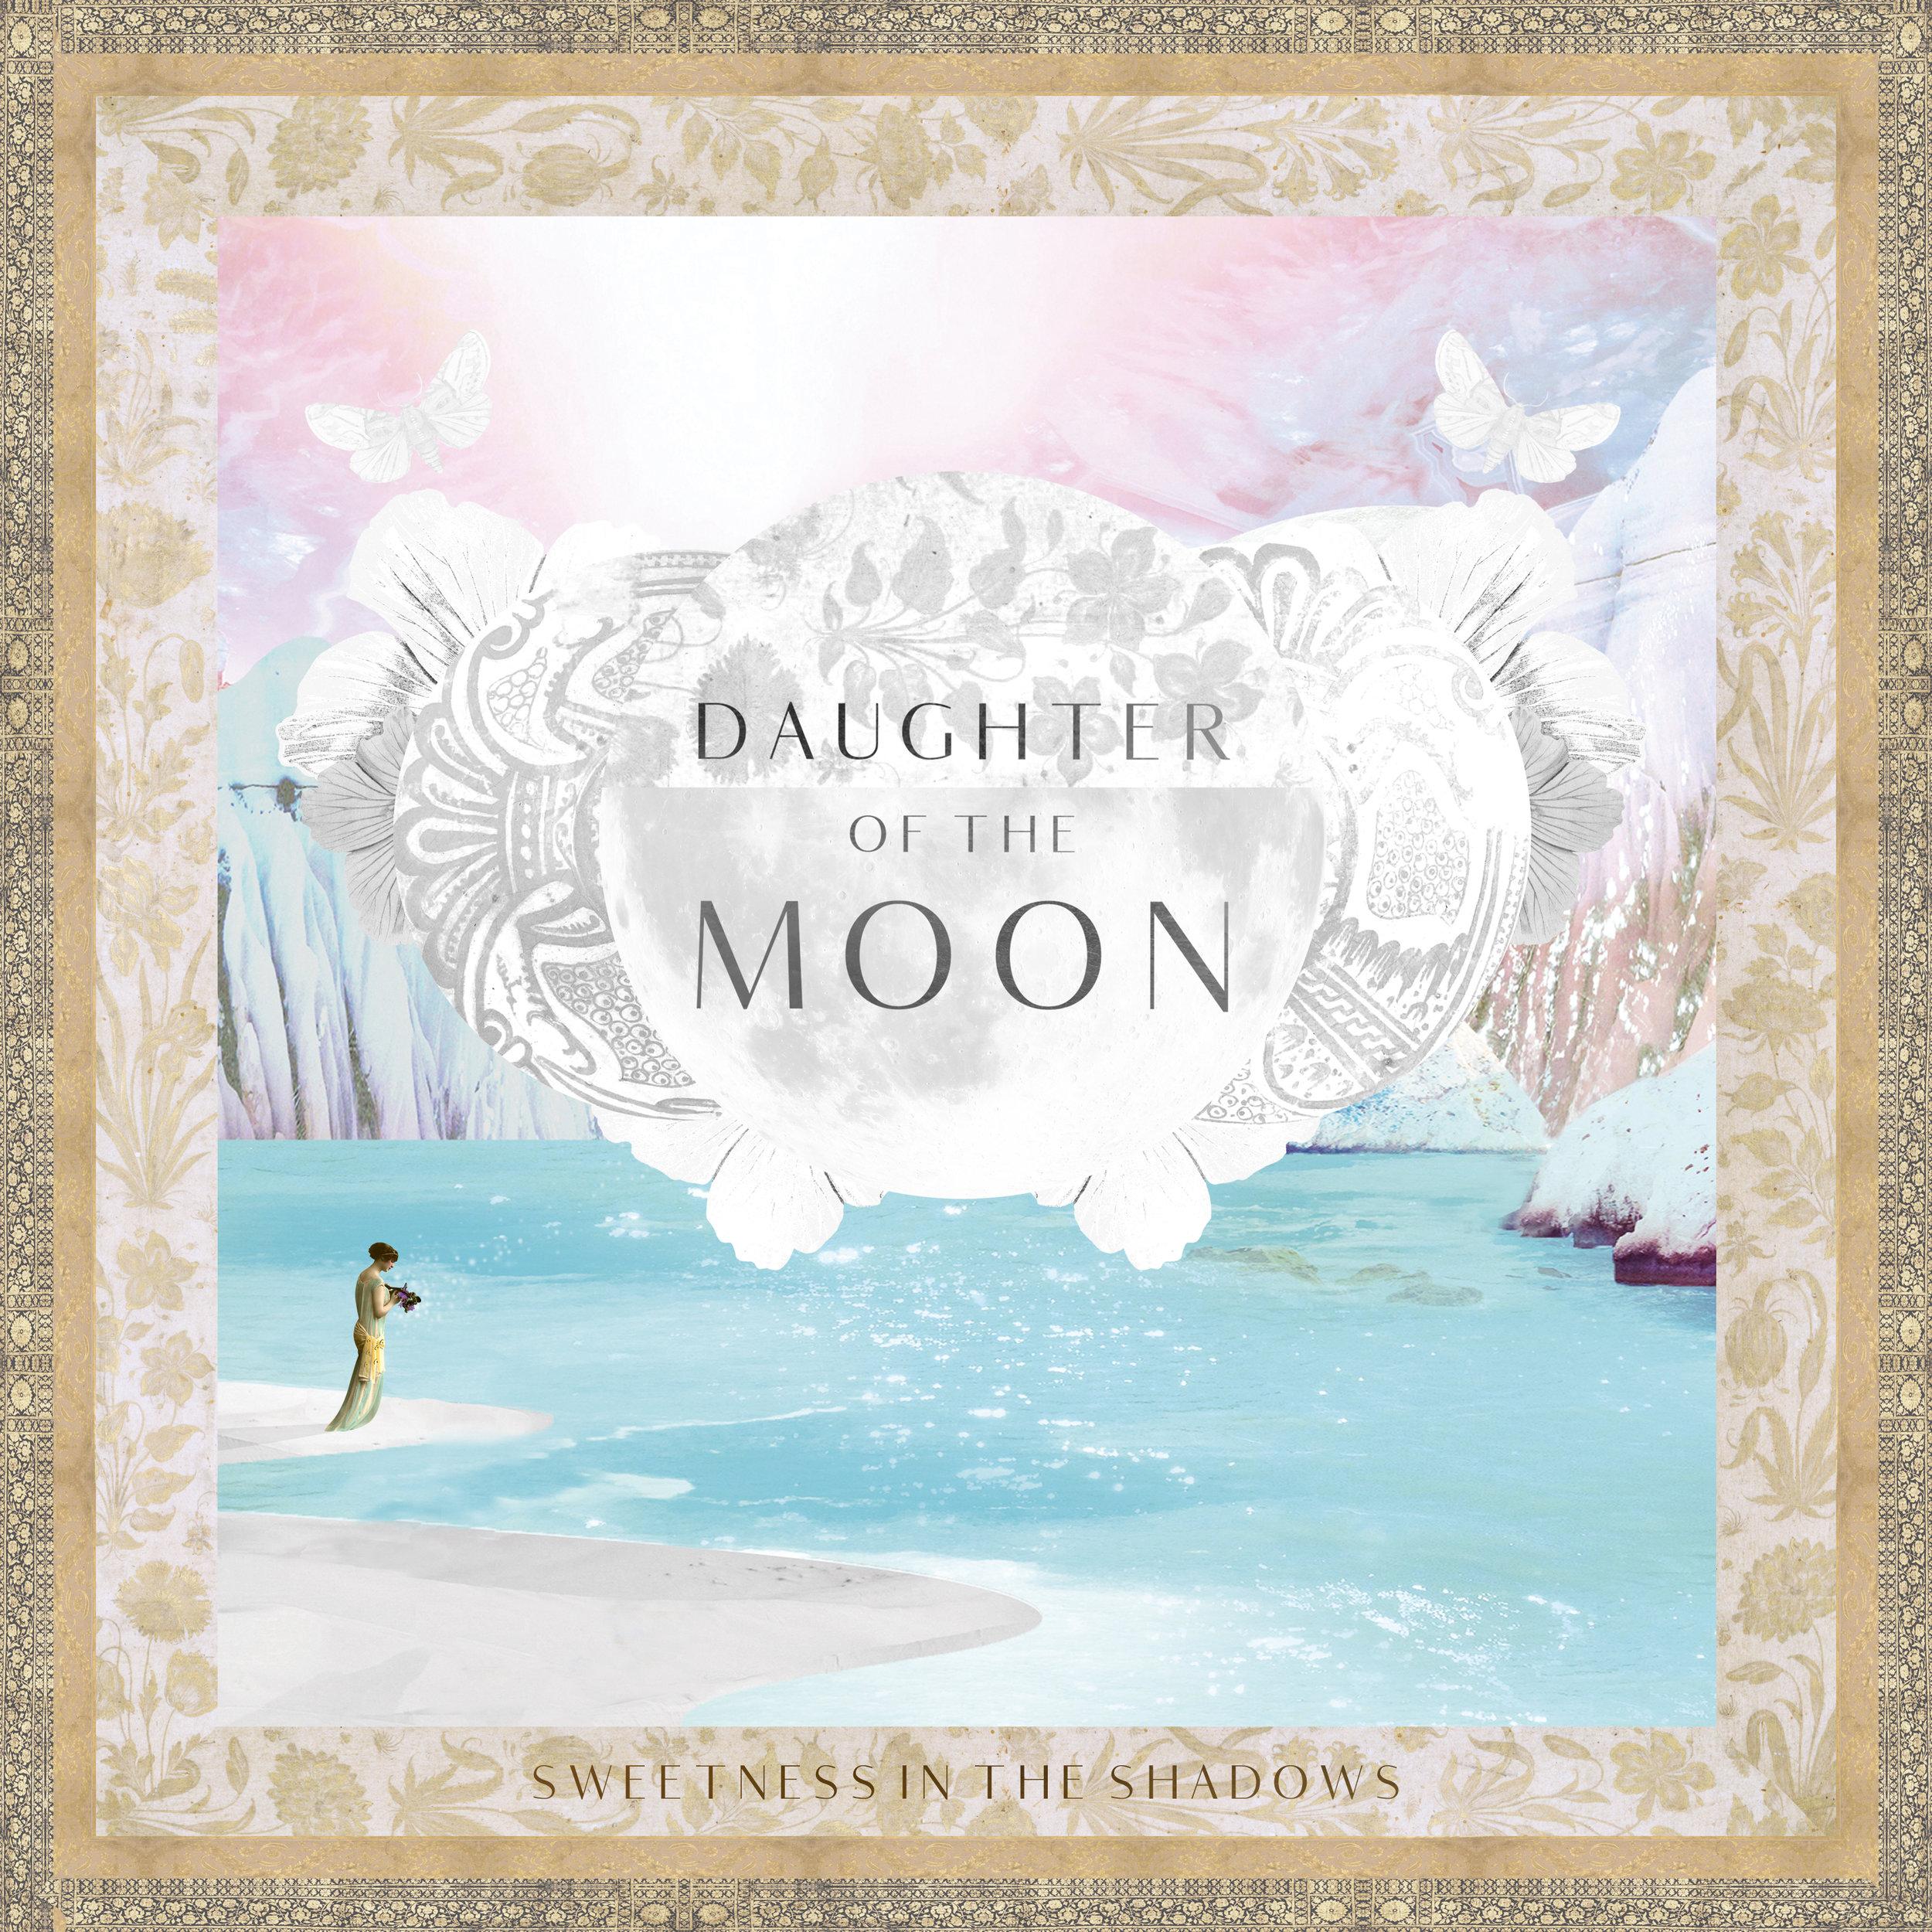 DAUGHTER-Cover-NEW-B&W.jpg